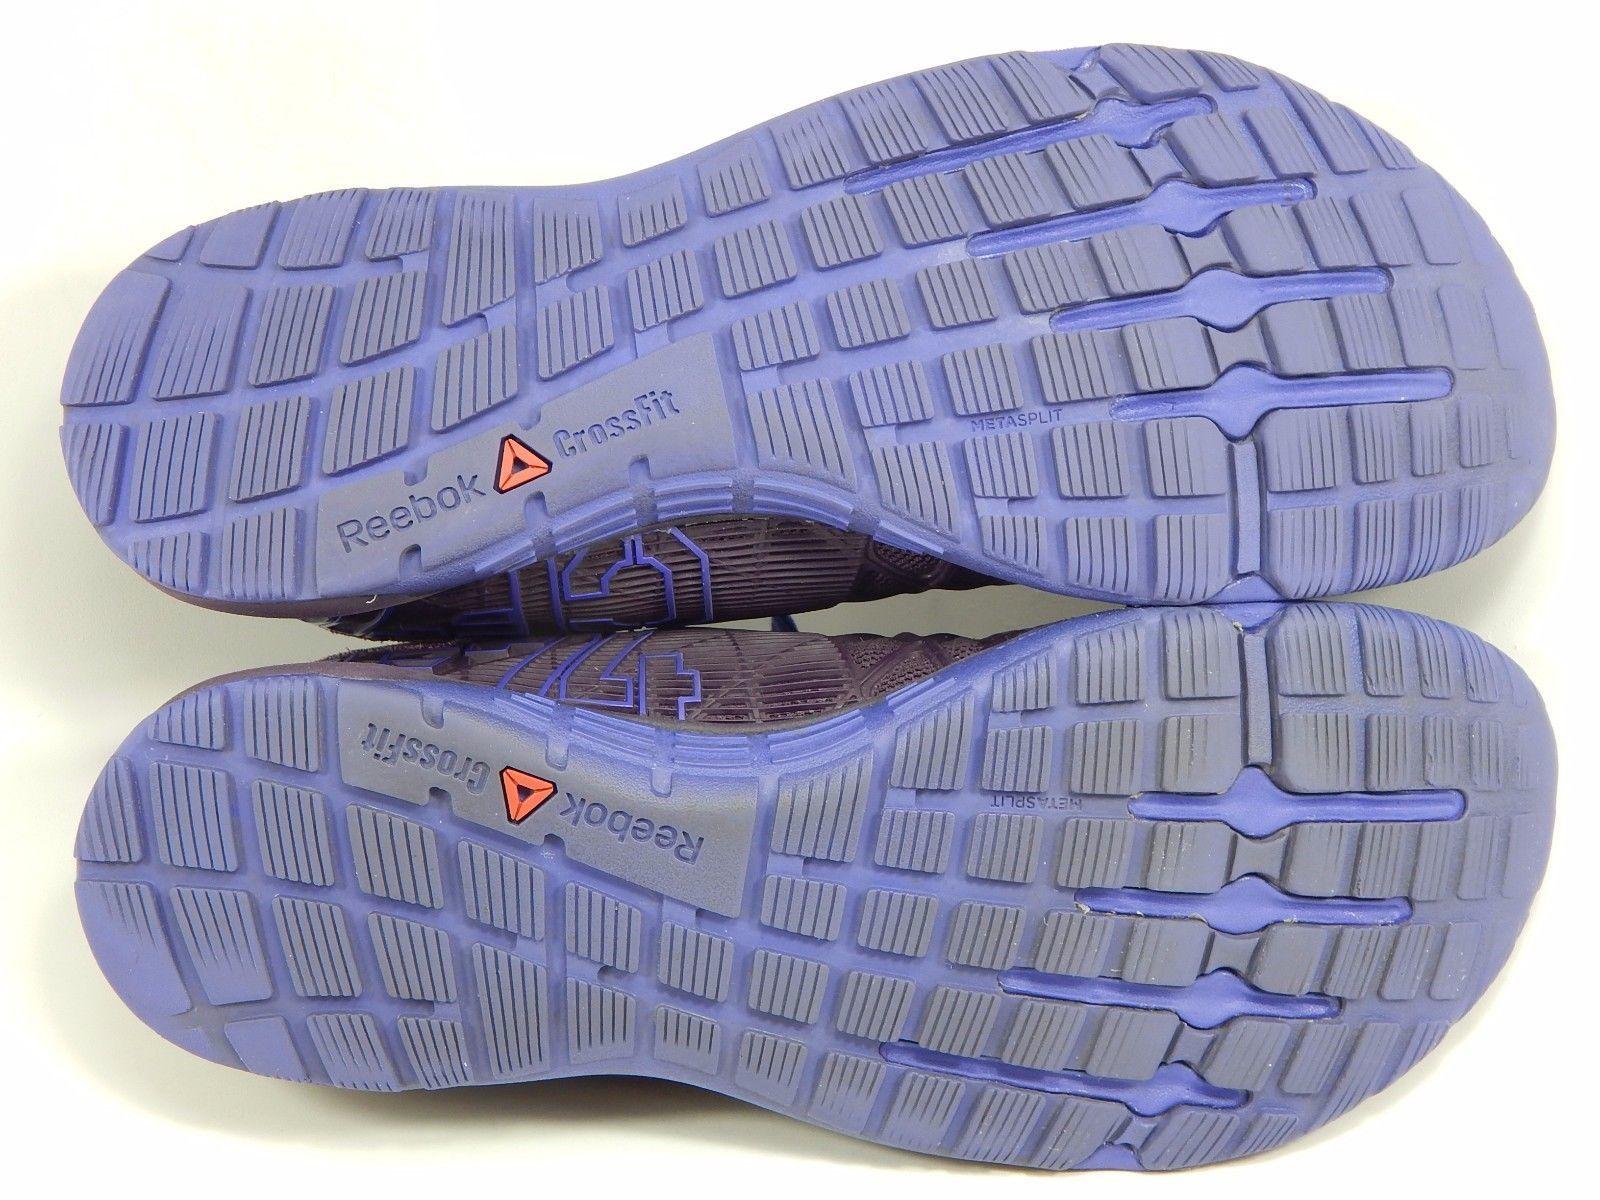 Reebok CrossFit Nano 4.0 Women's Training Shoes Size US 8.5 M (B) EU 39 M43441